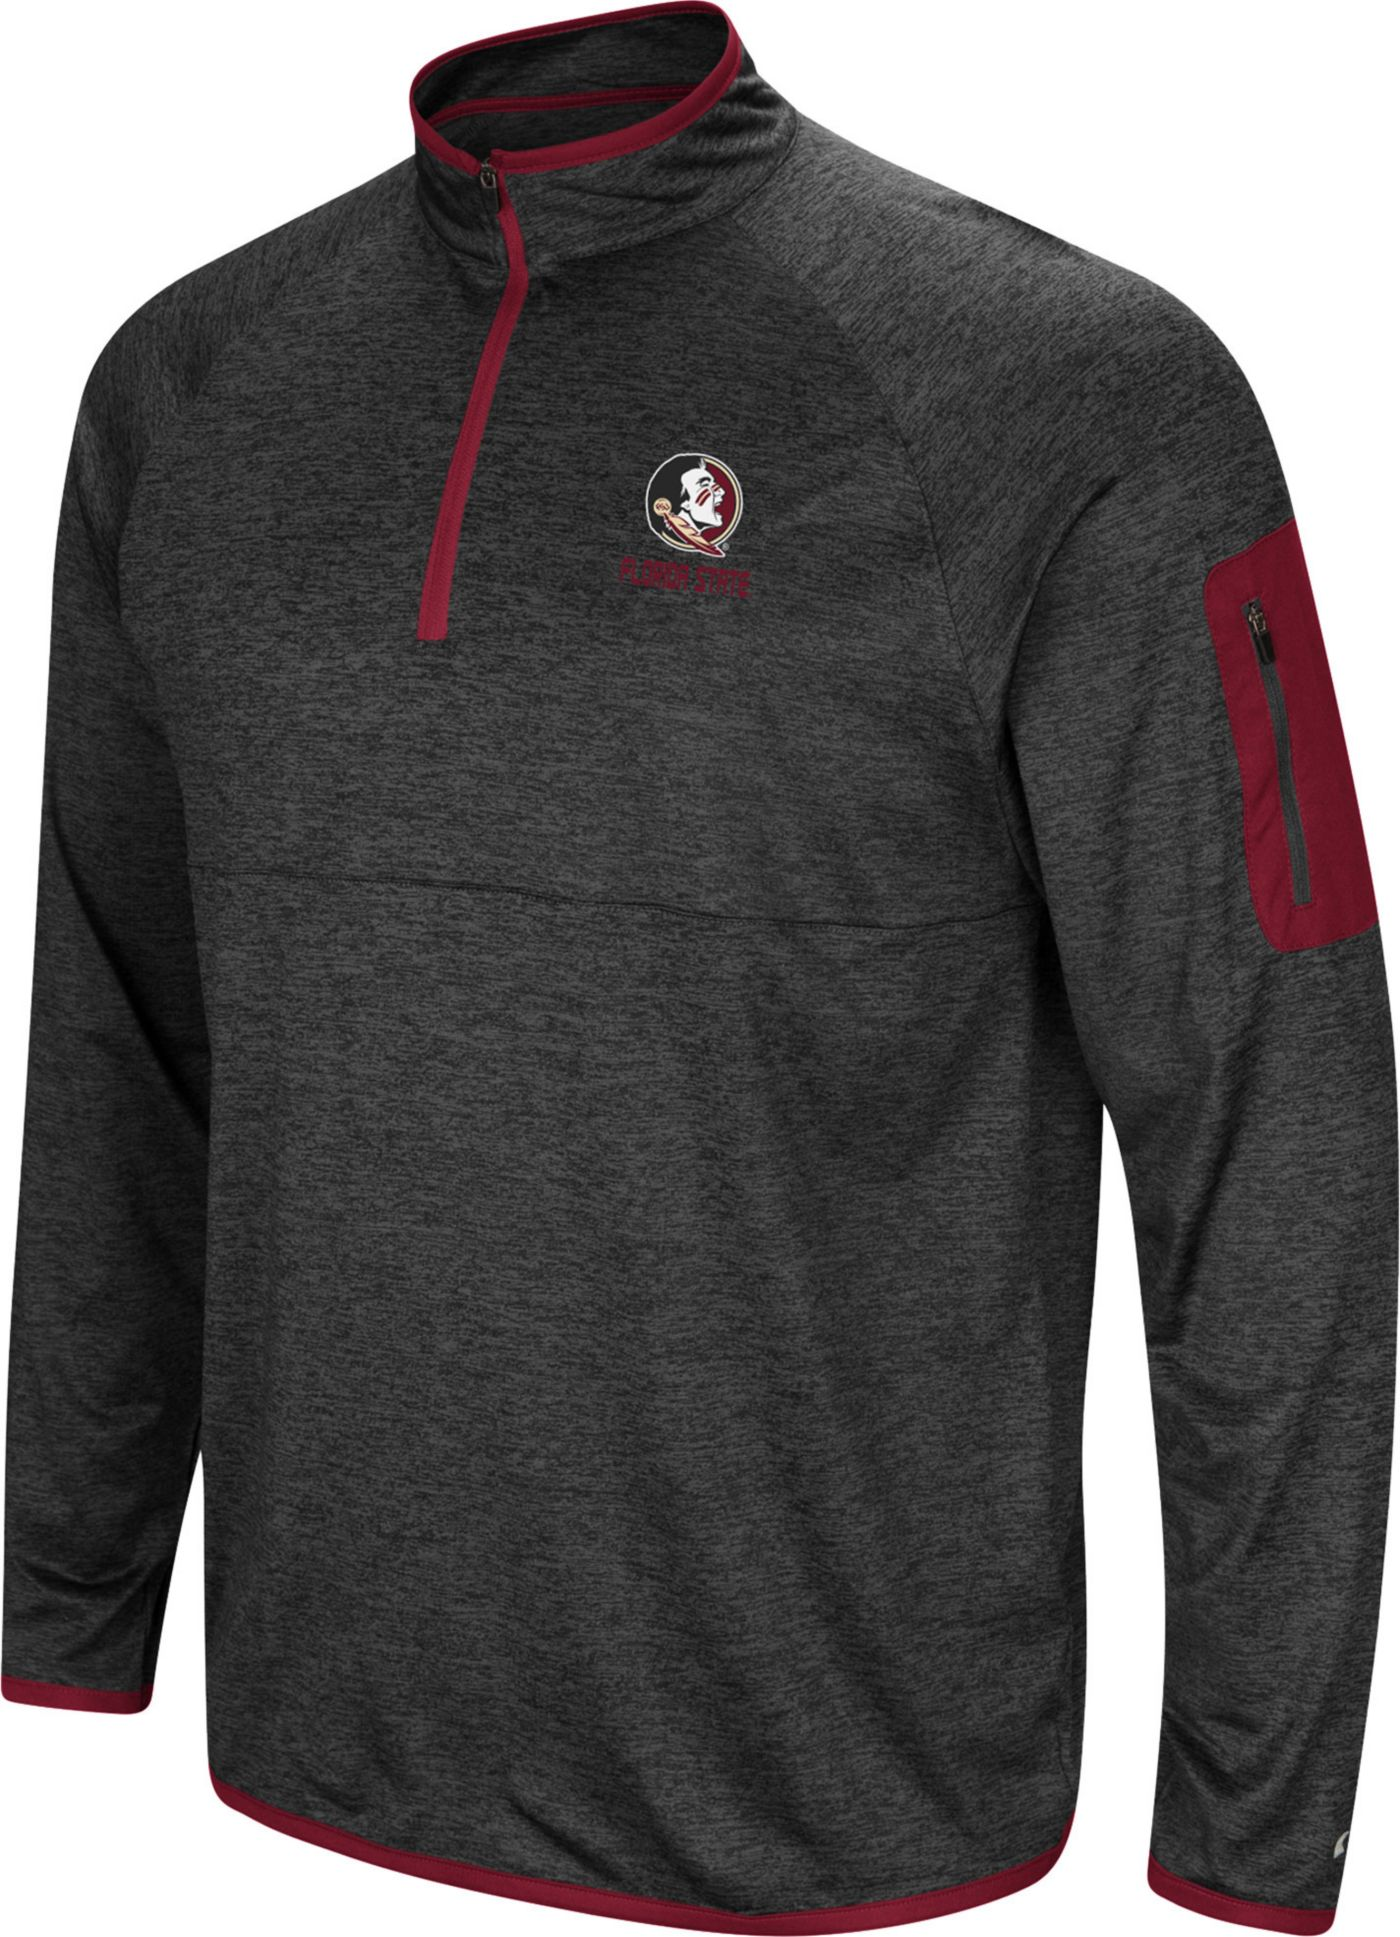 Colosseum Men's Florida State Seminoles Grey Indus River Quarter-Zip Shirt